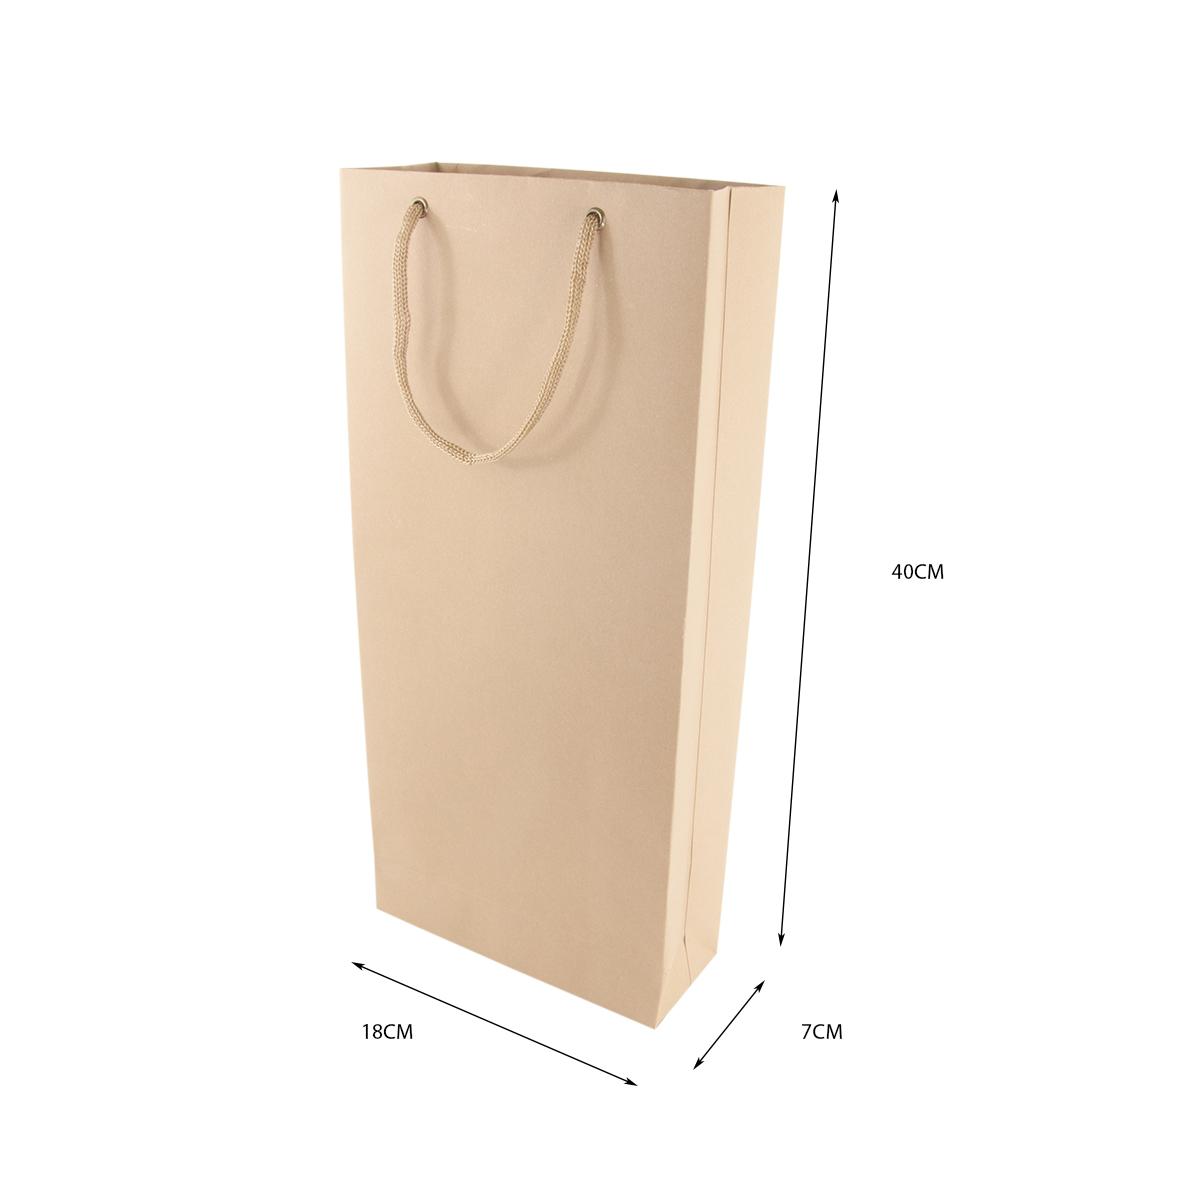 Sacola para 2 Garrafas Vinho Kraft 40x18x7 - 100 Unidades